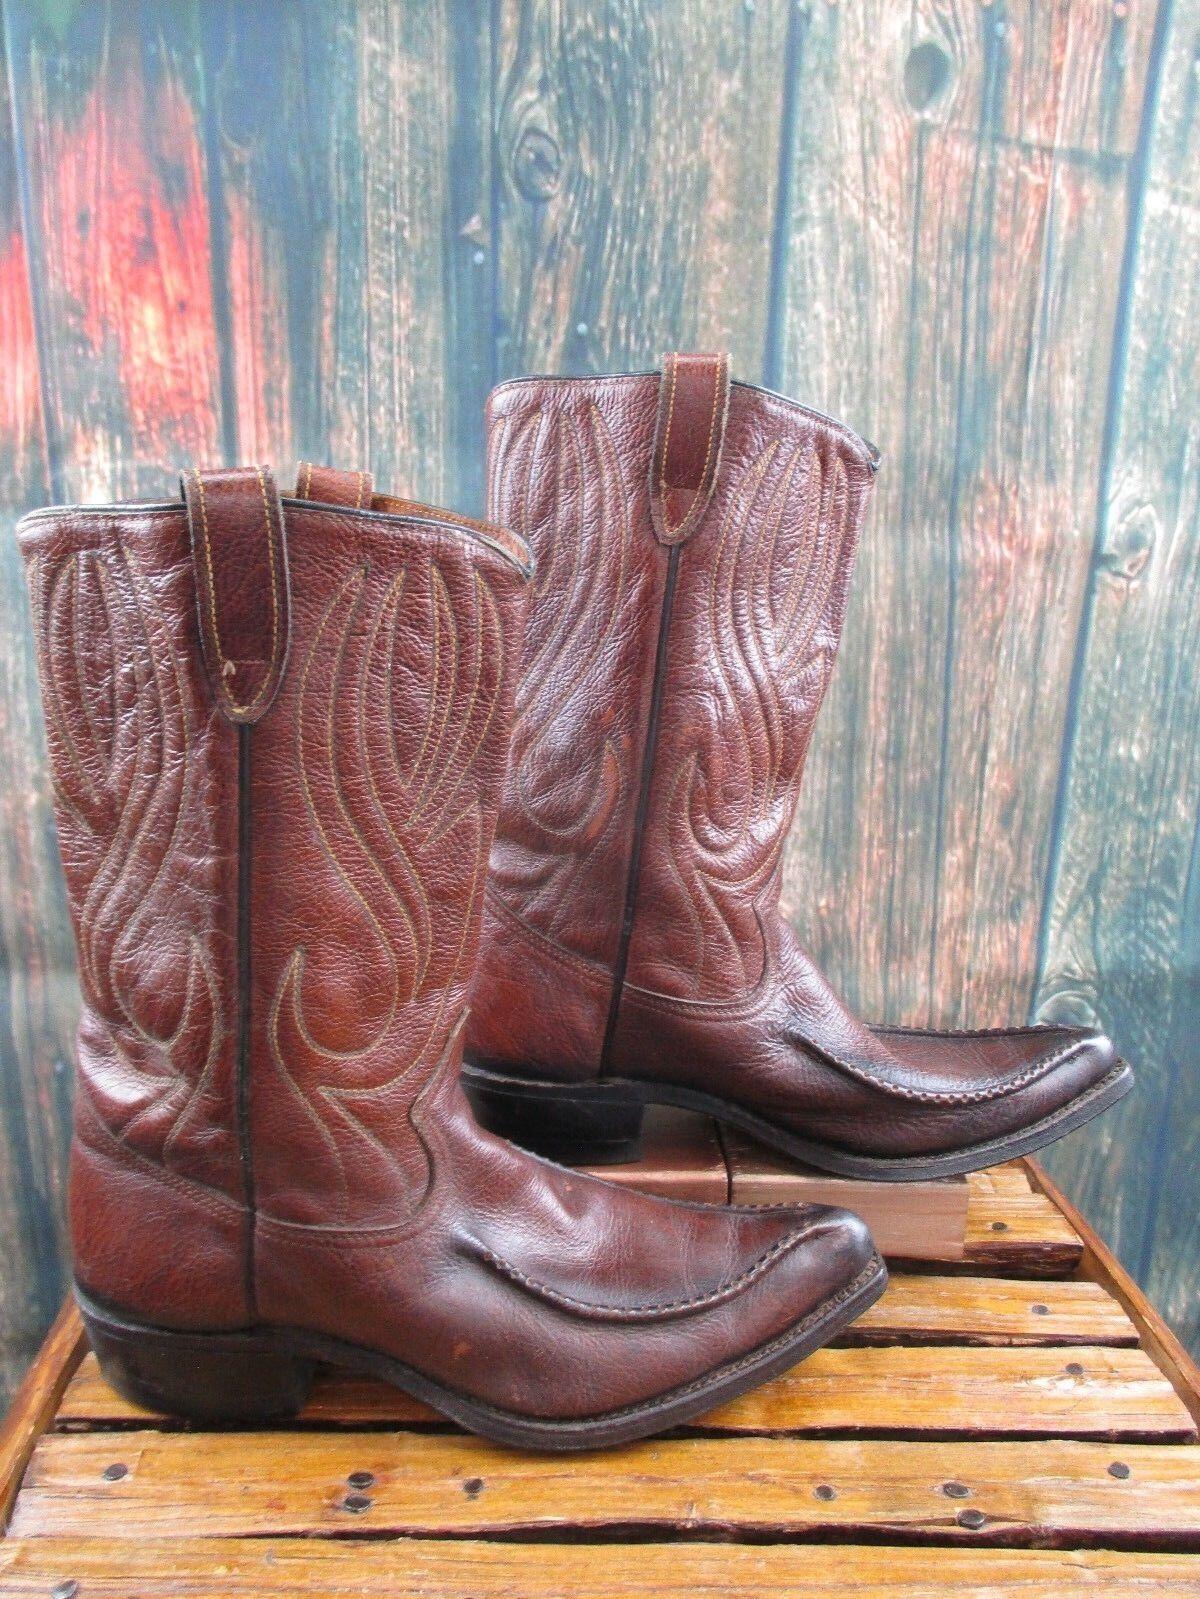 basso prezzo del 40% Vintage Vintage Vintage Uomo Sears Marrone Leather Cowboy Western stivali Dimensione  9 D  shopping online di moda